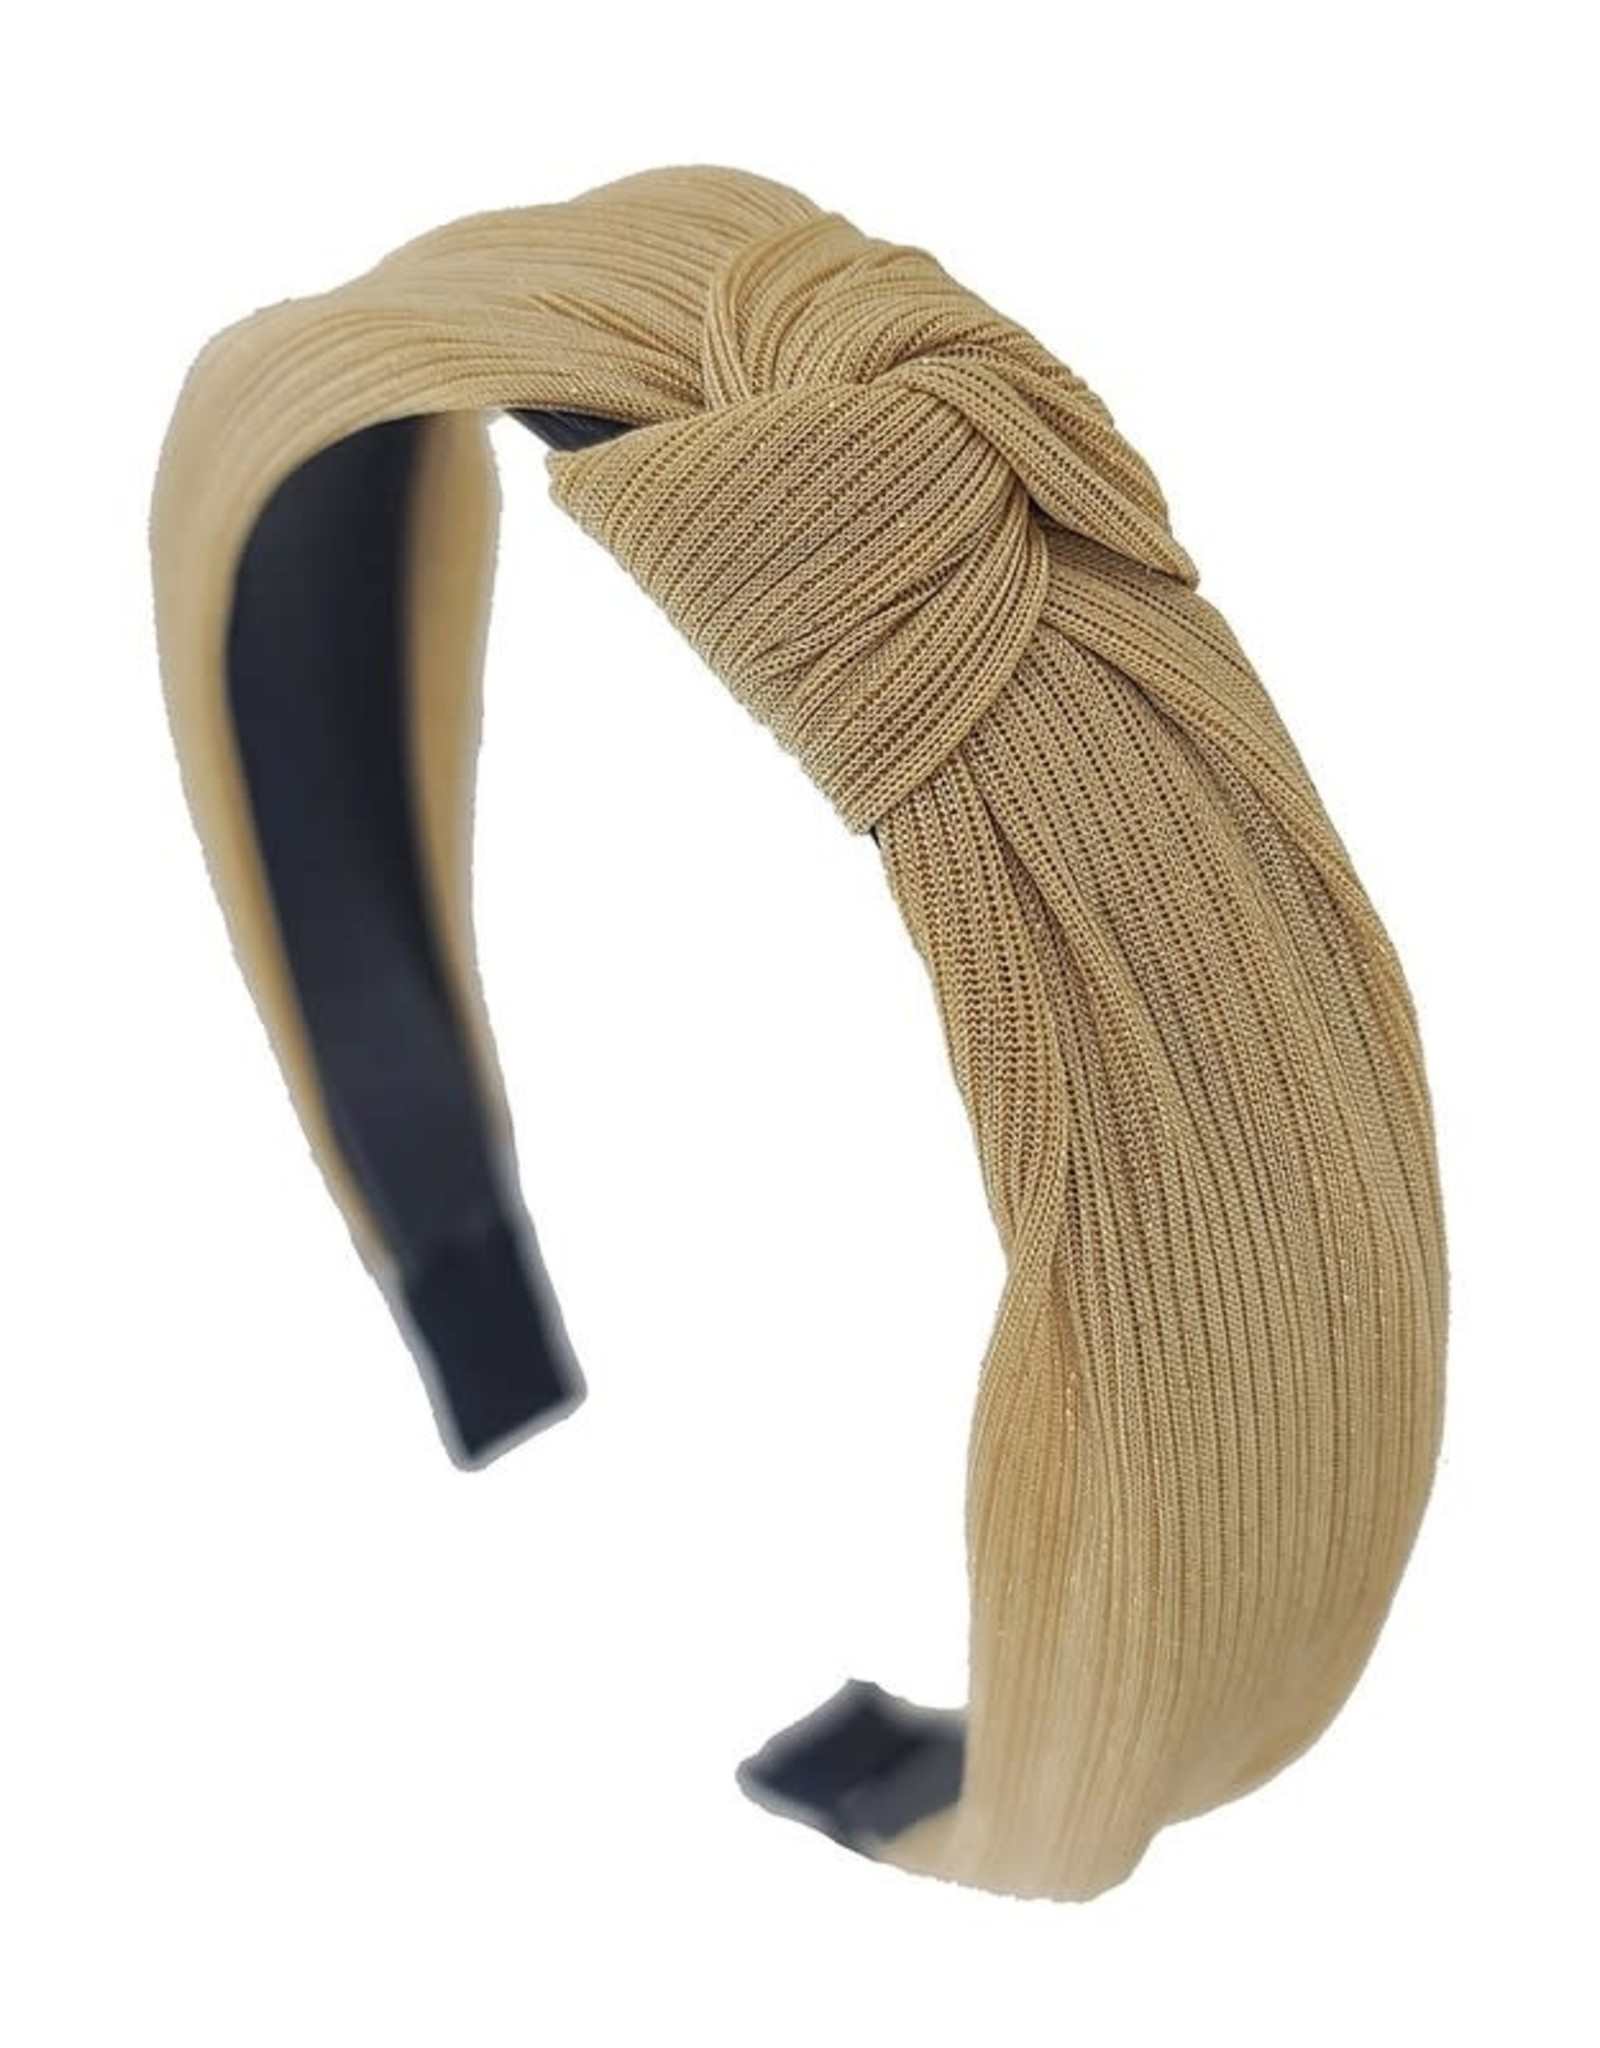 Funteze Accessories JODY Shine Headband